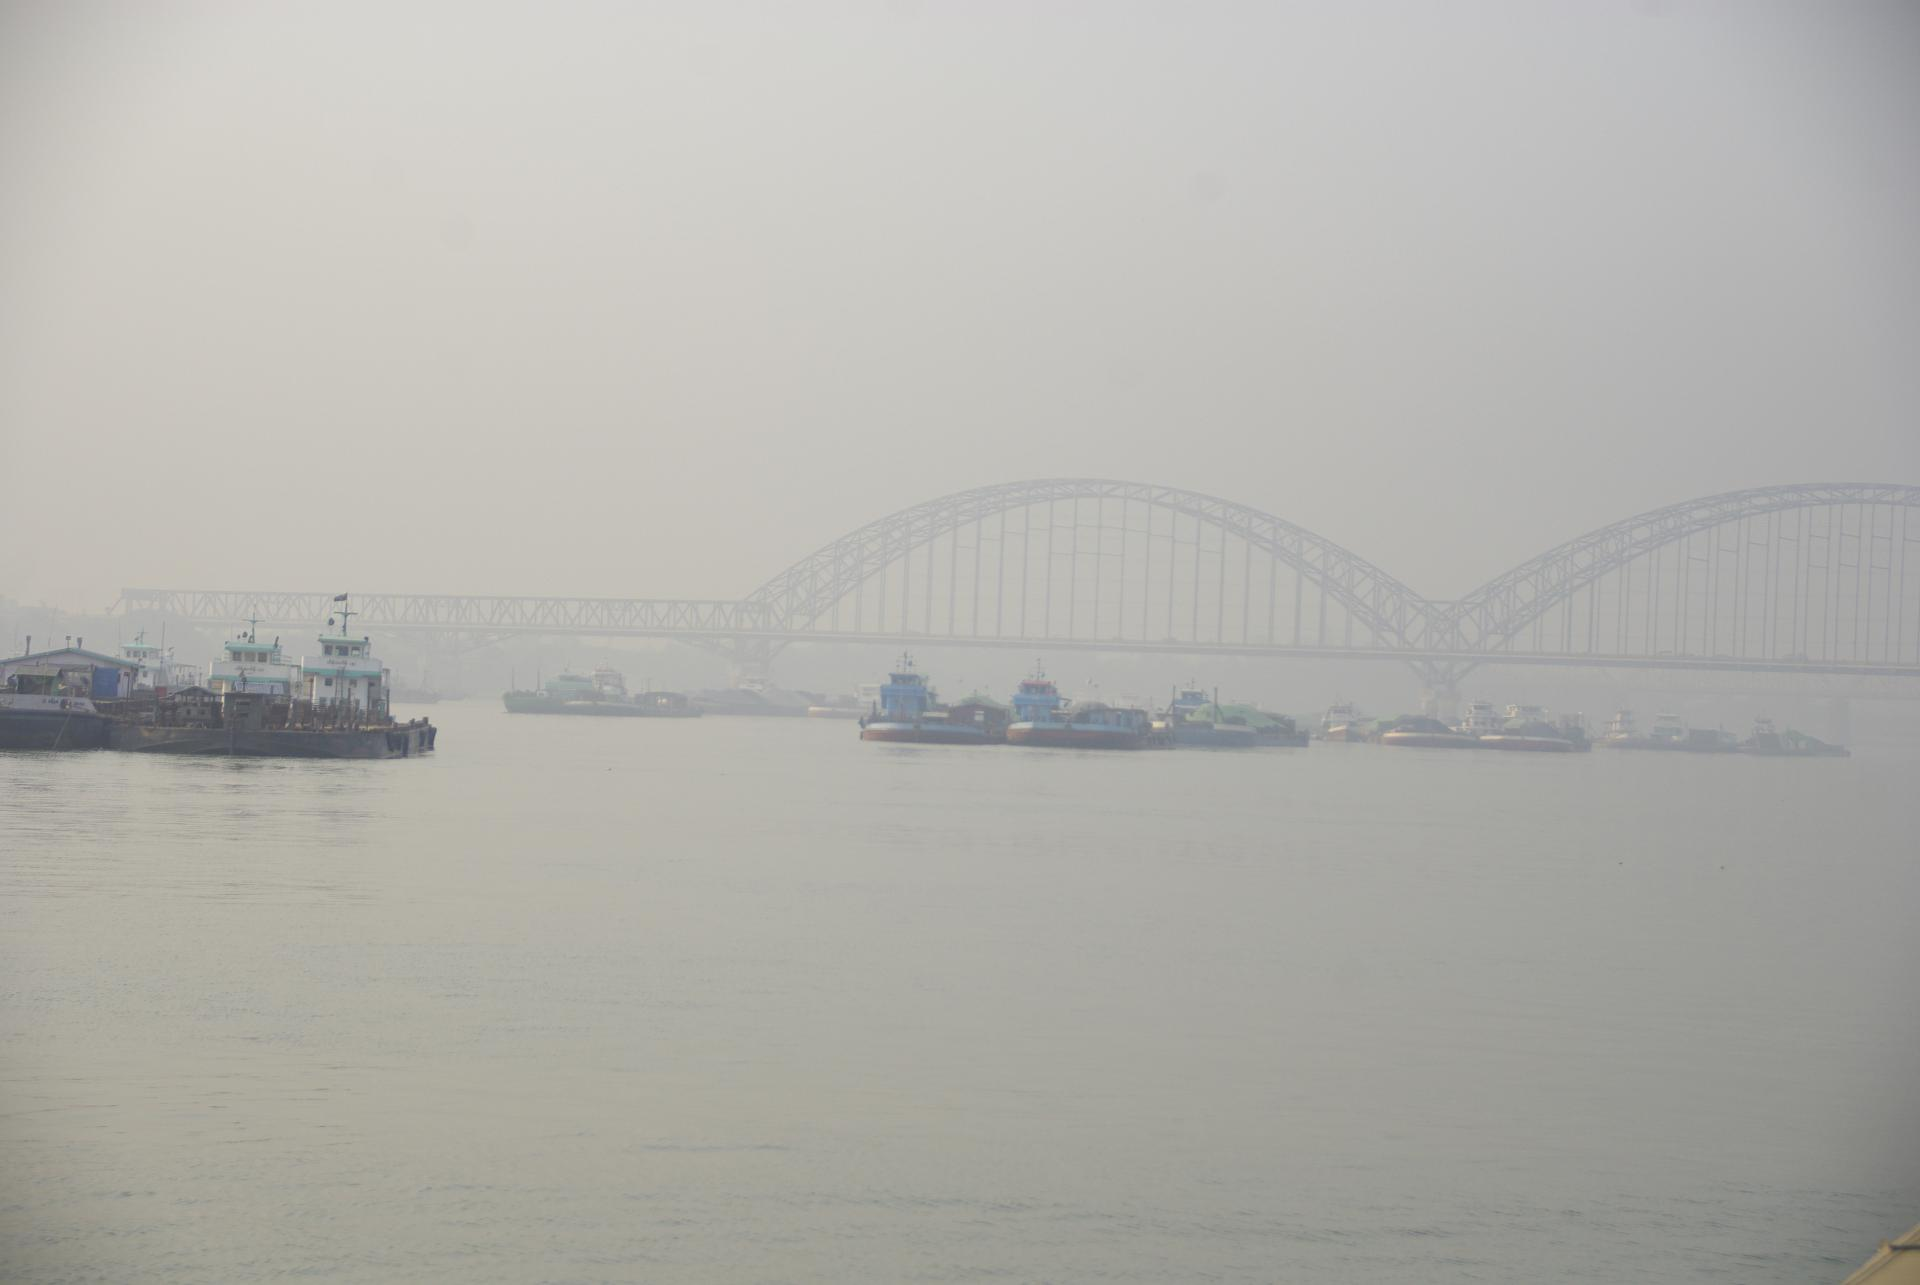 Irrawady 5